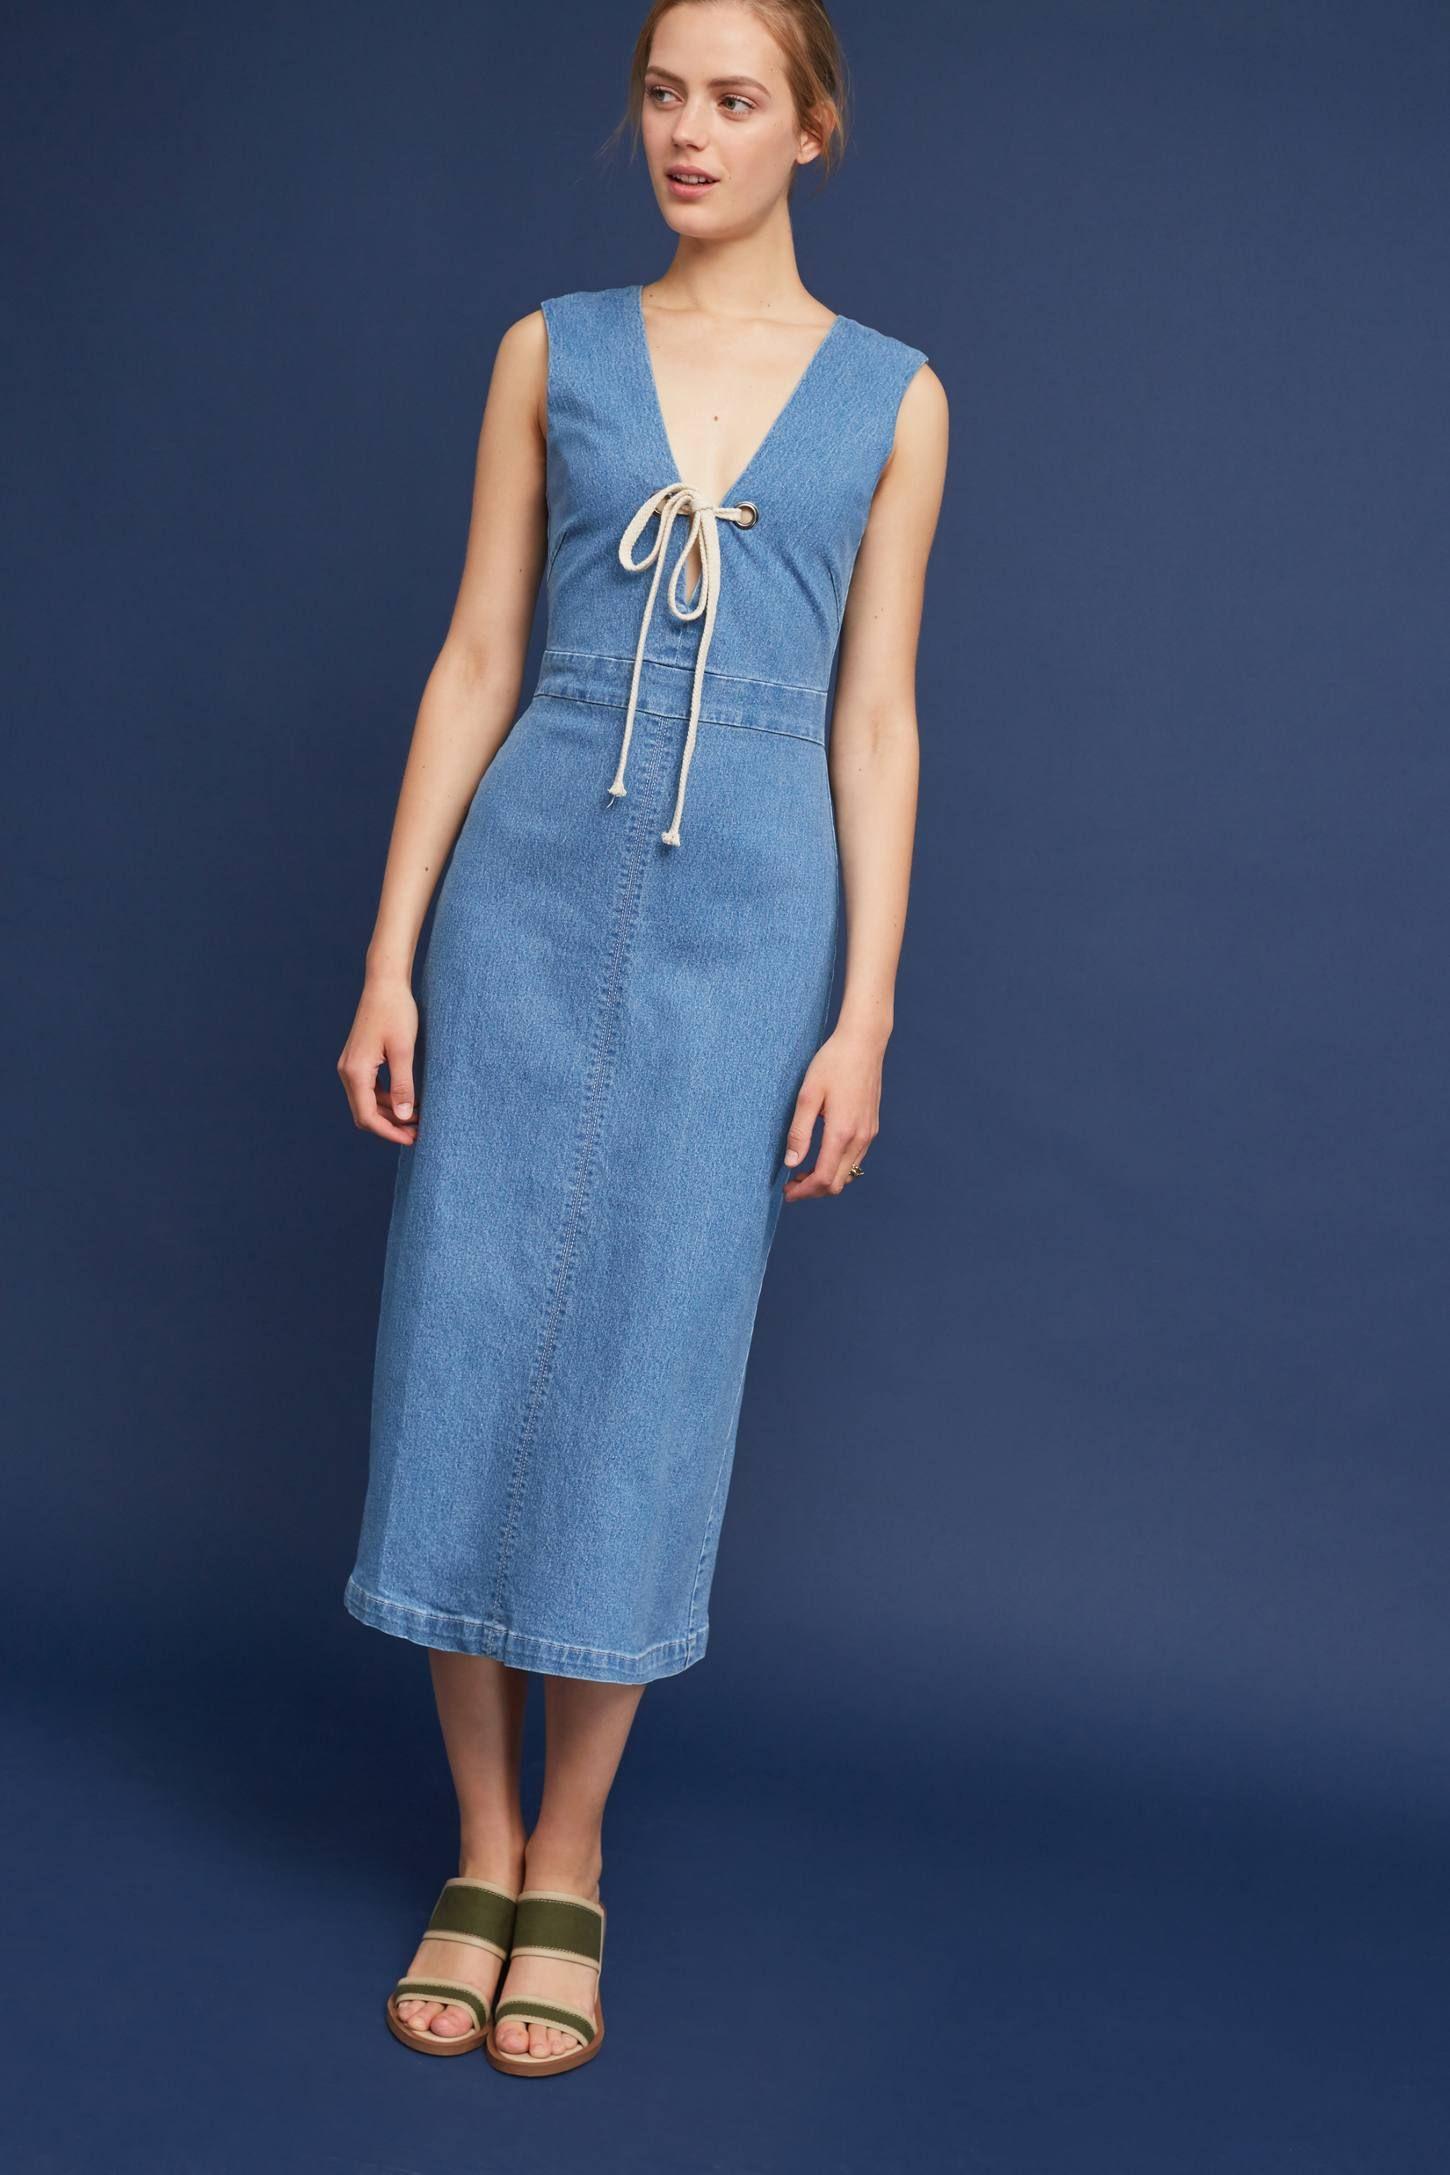 Rope-Tied Denim Midi Dress   Denim midi dress, Rope tying and Midi ...